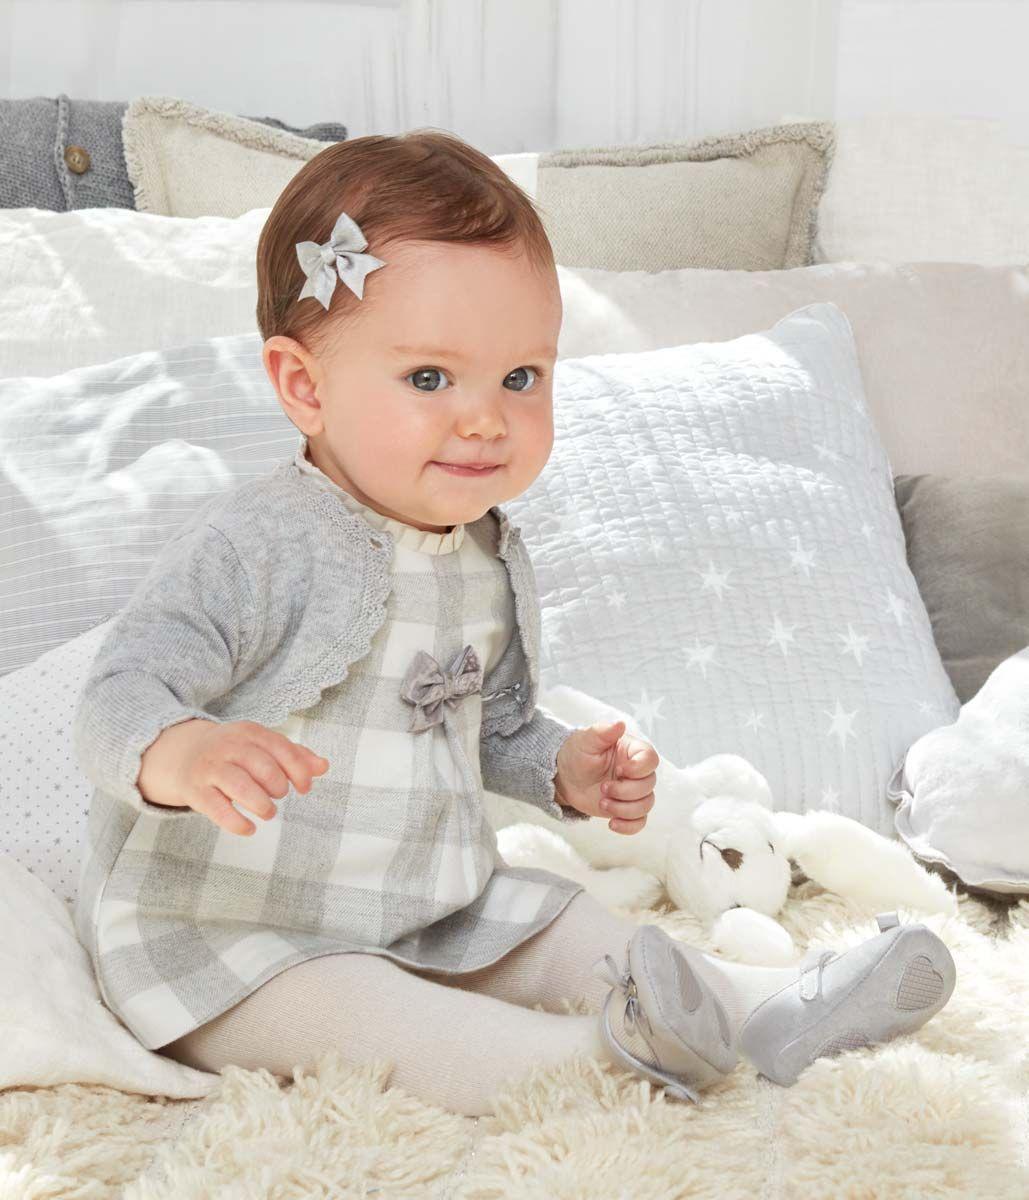 Coleccion Recien Nacido Ropa Linda De Bebe Accesorios Para Bebe Nina Moda De Bebes Nina